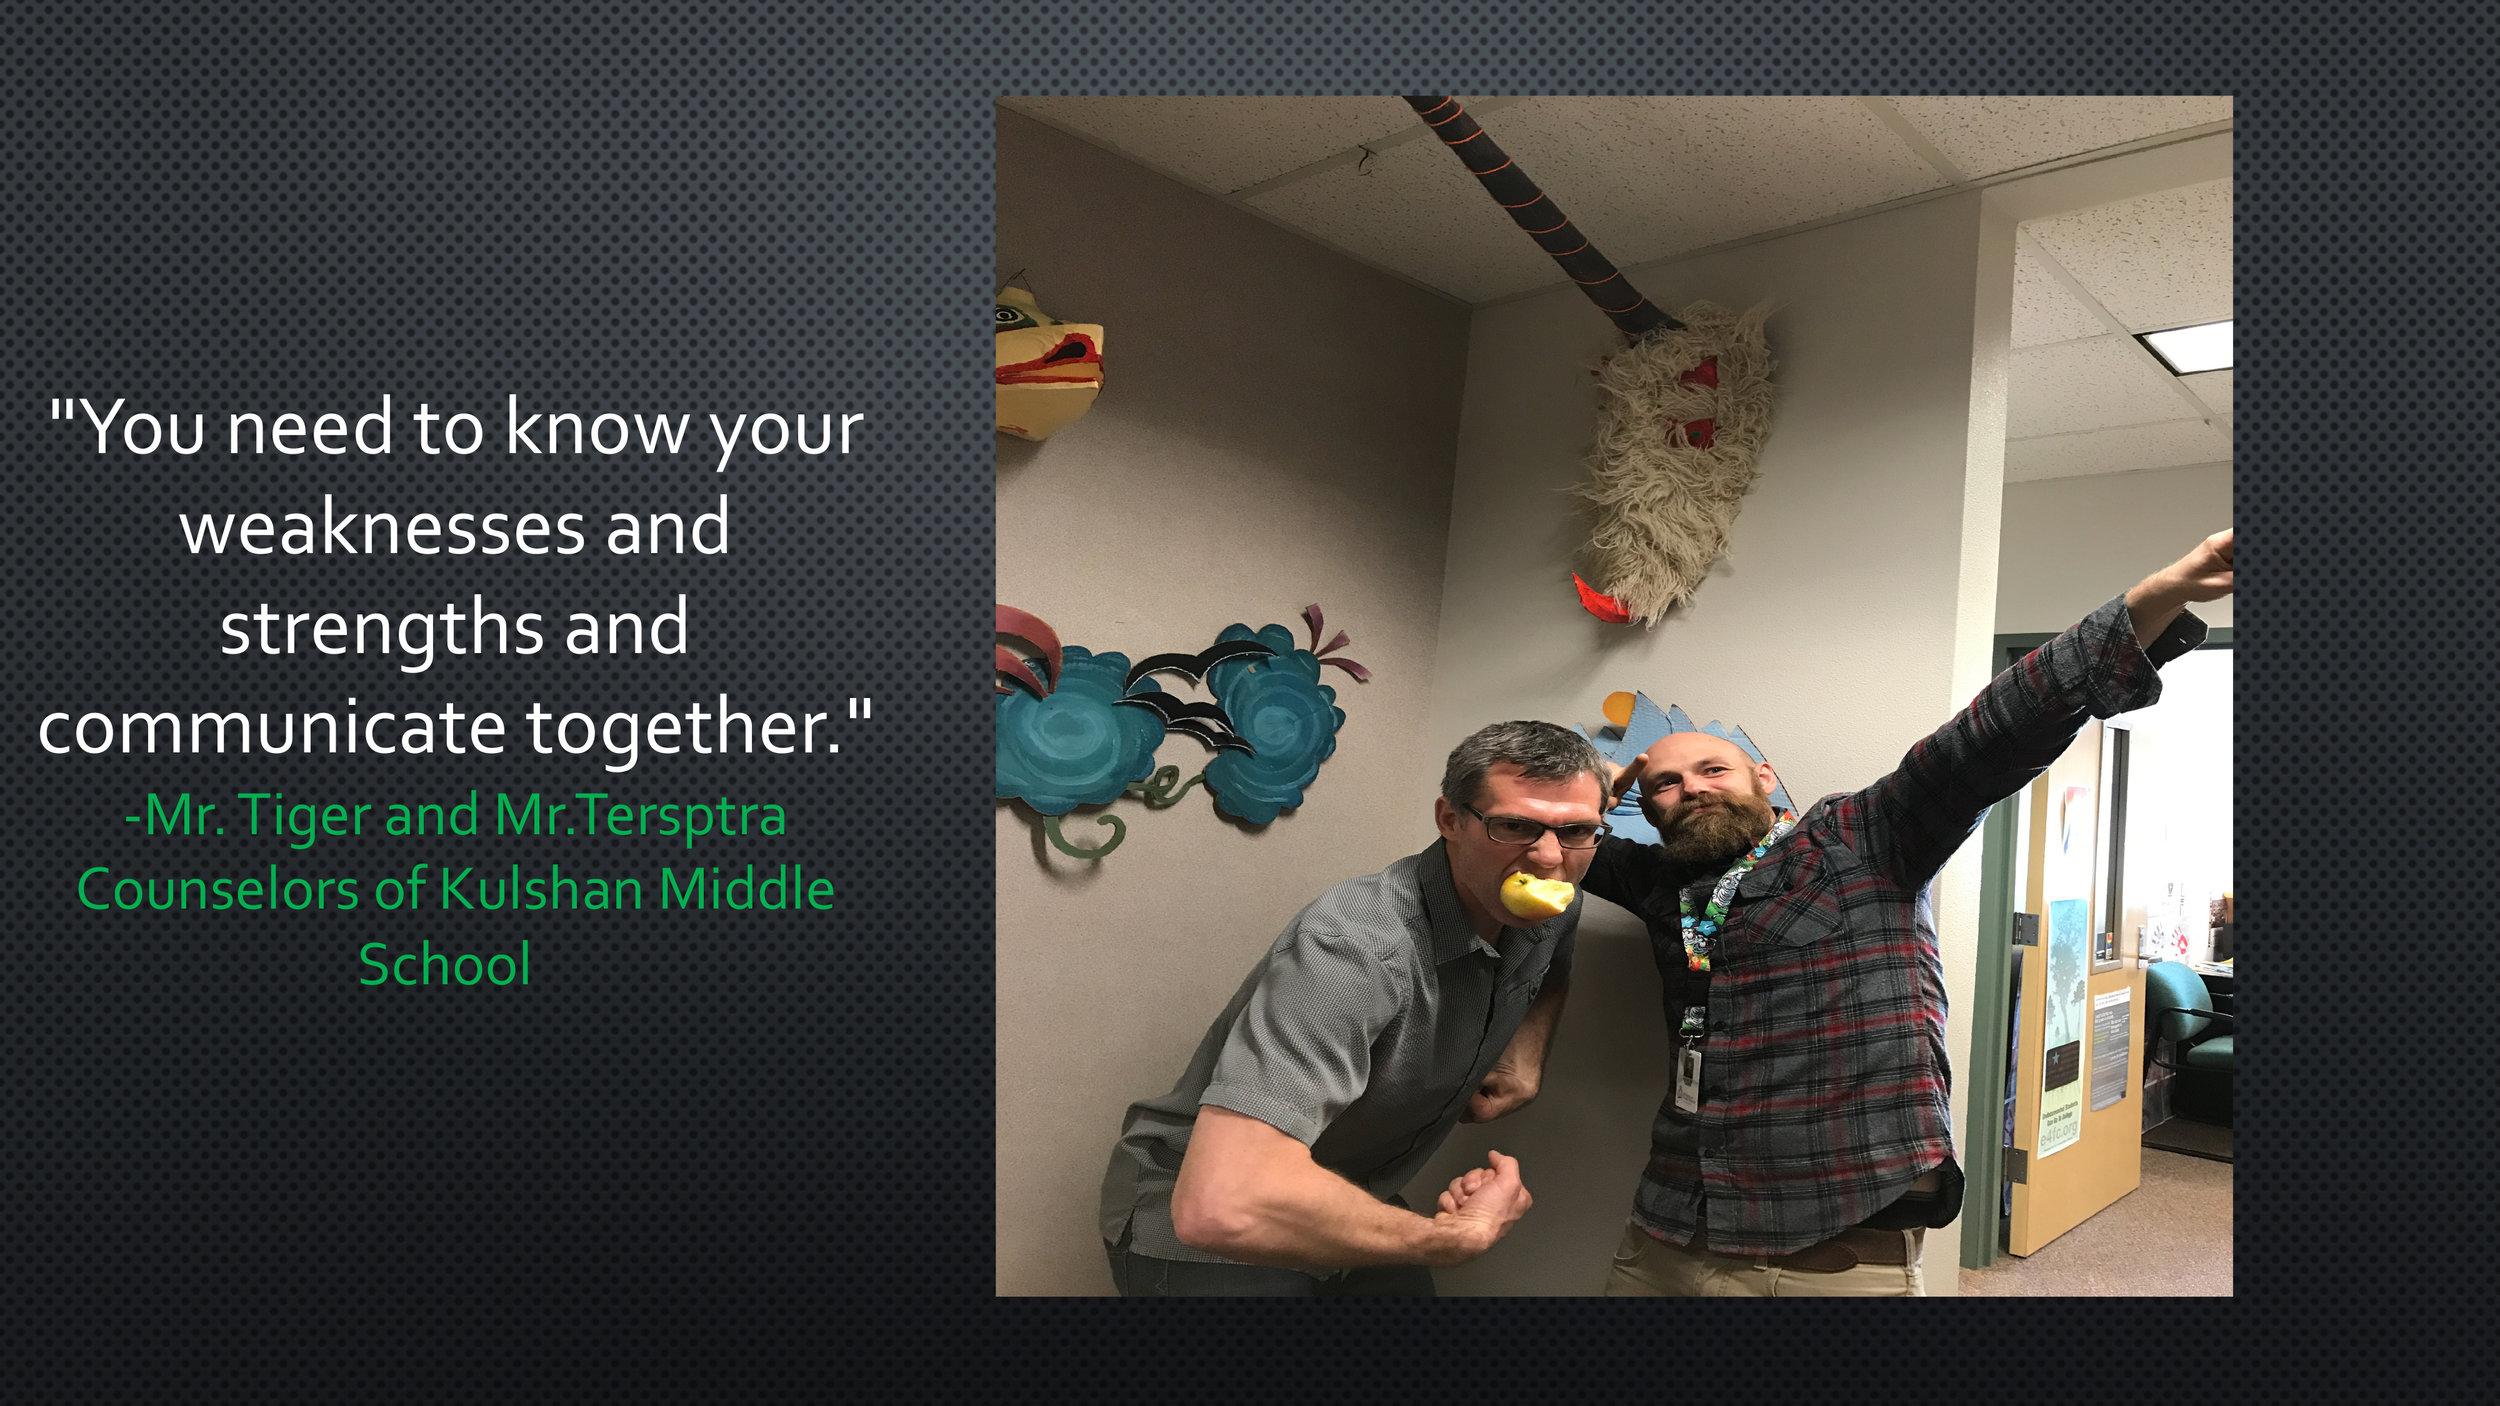 PorkandBeans- Teamwork-7.jpg